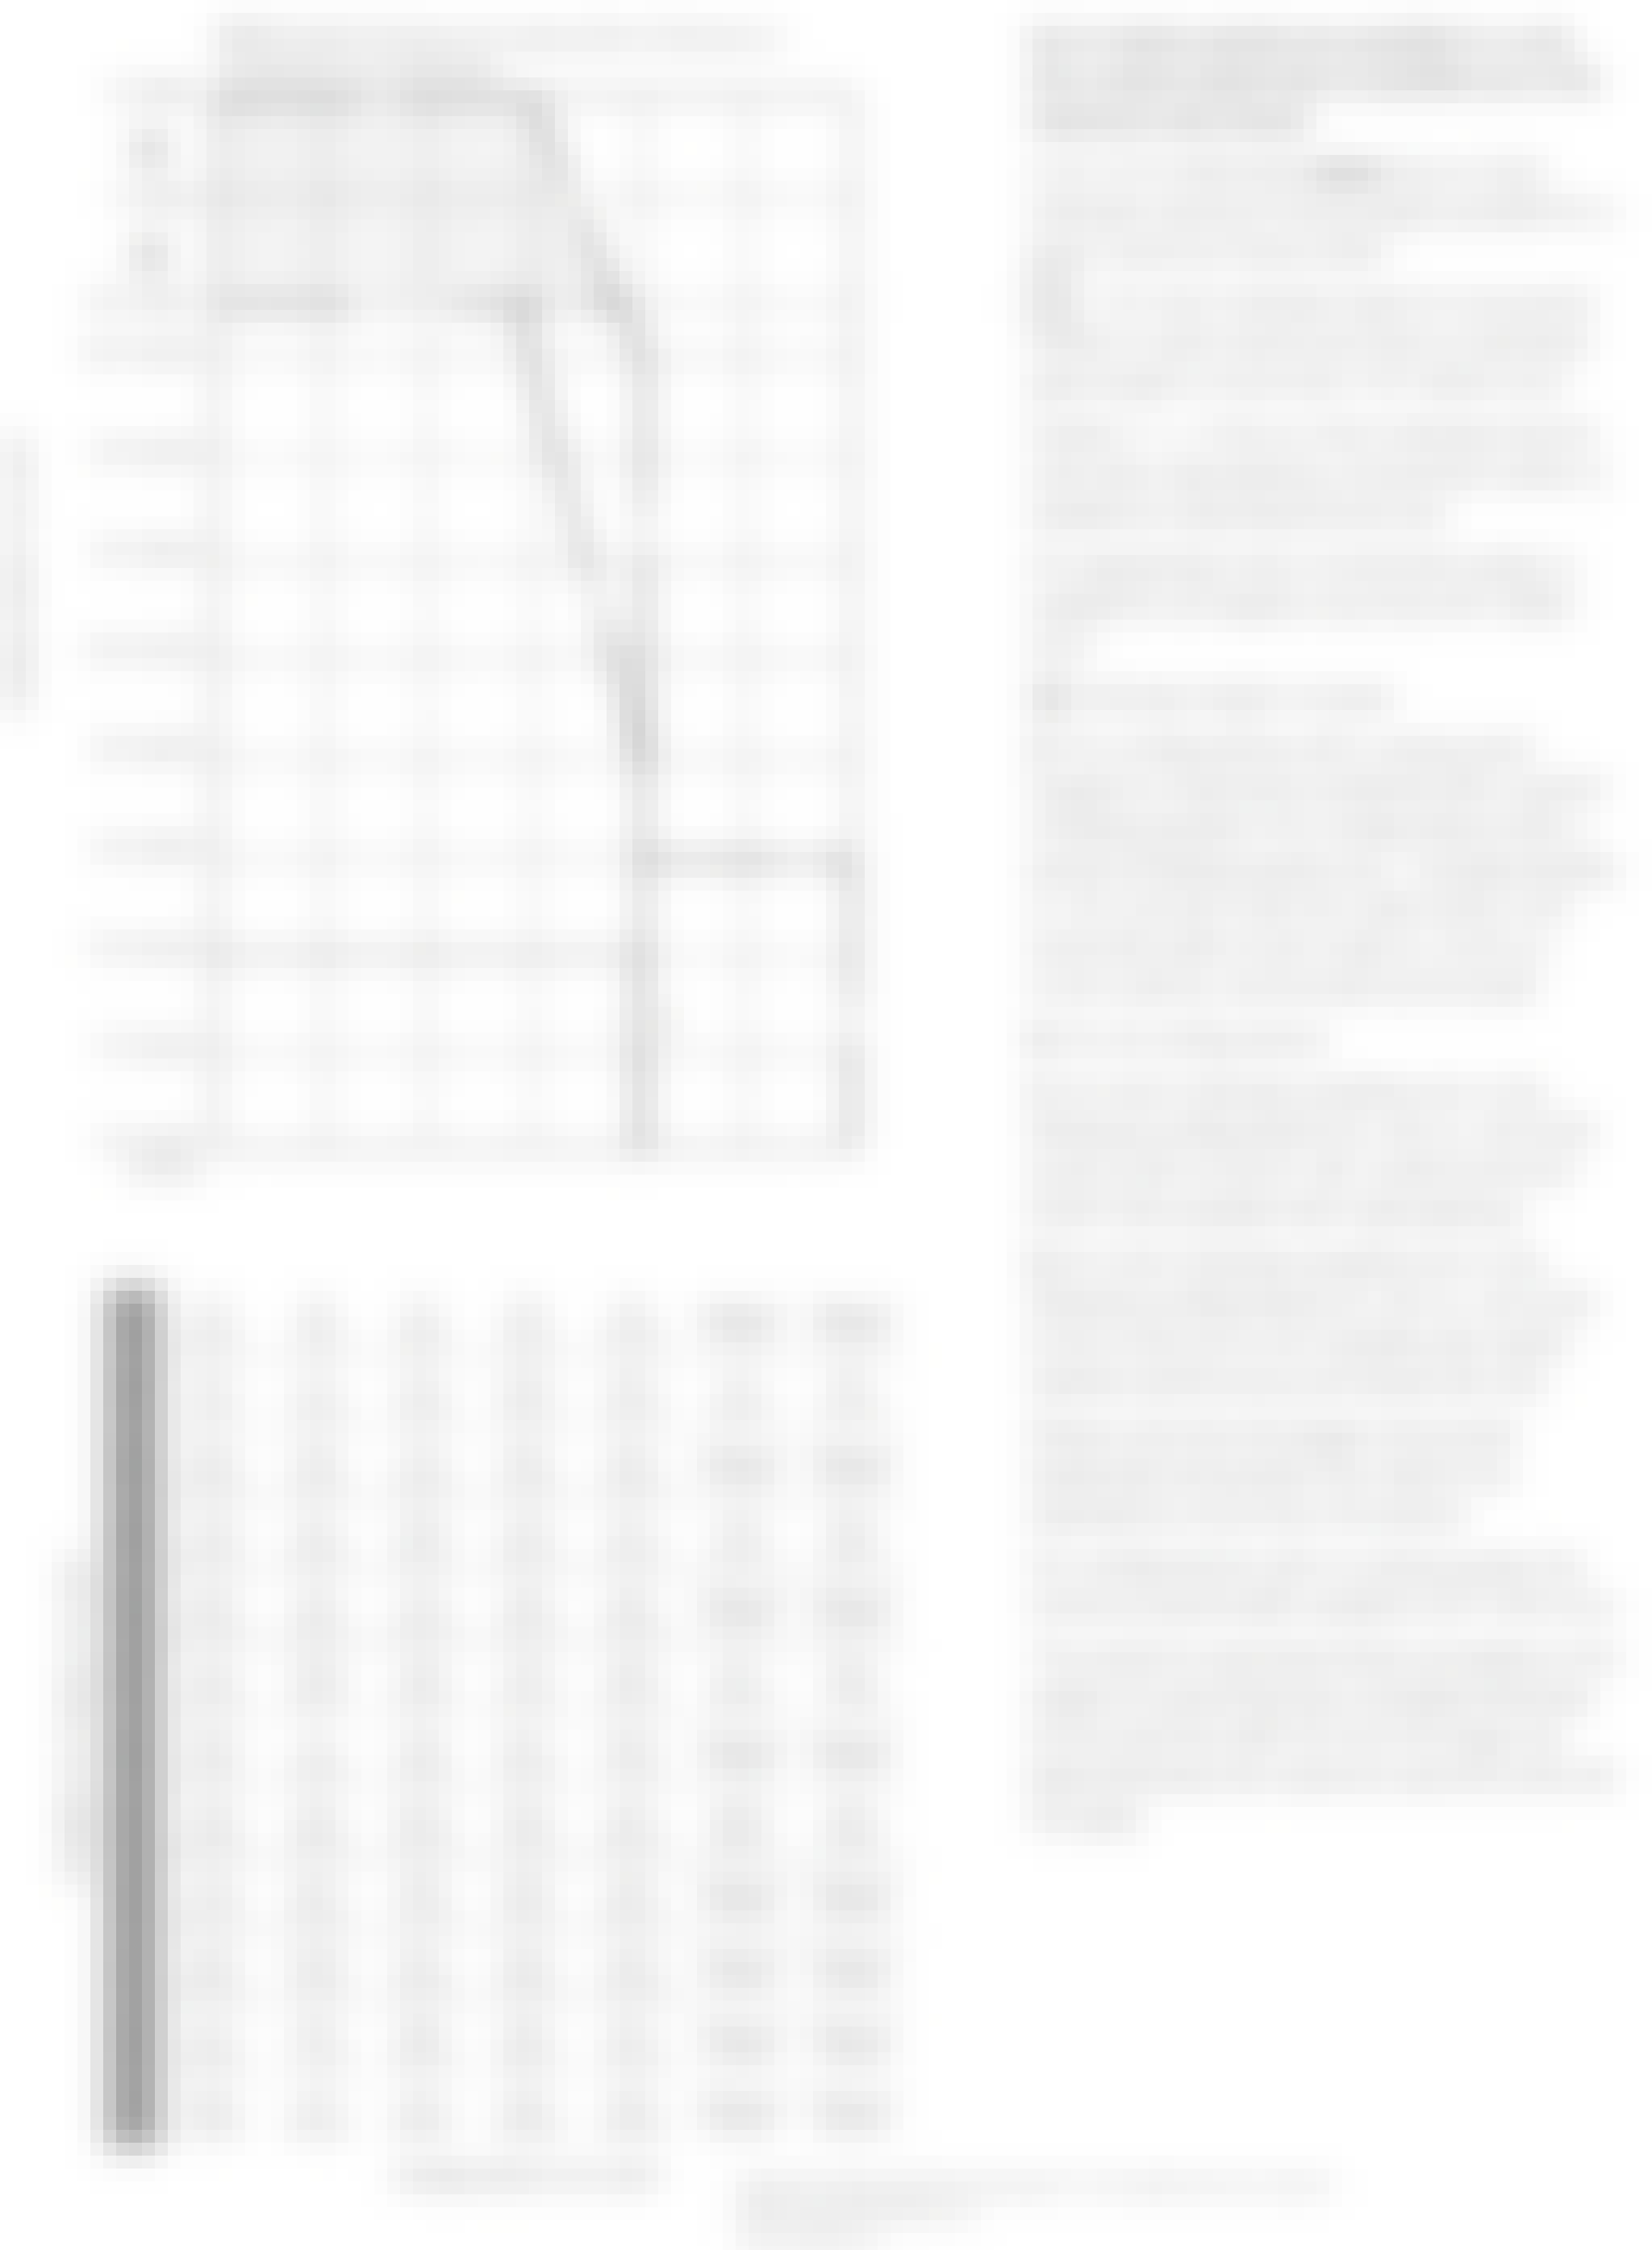 SL70 maximum size chart